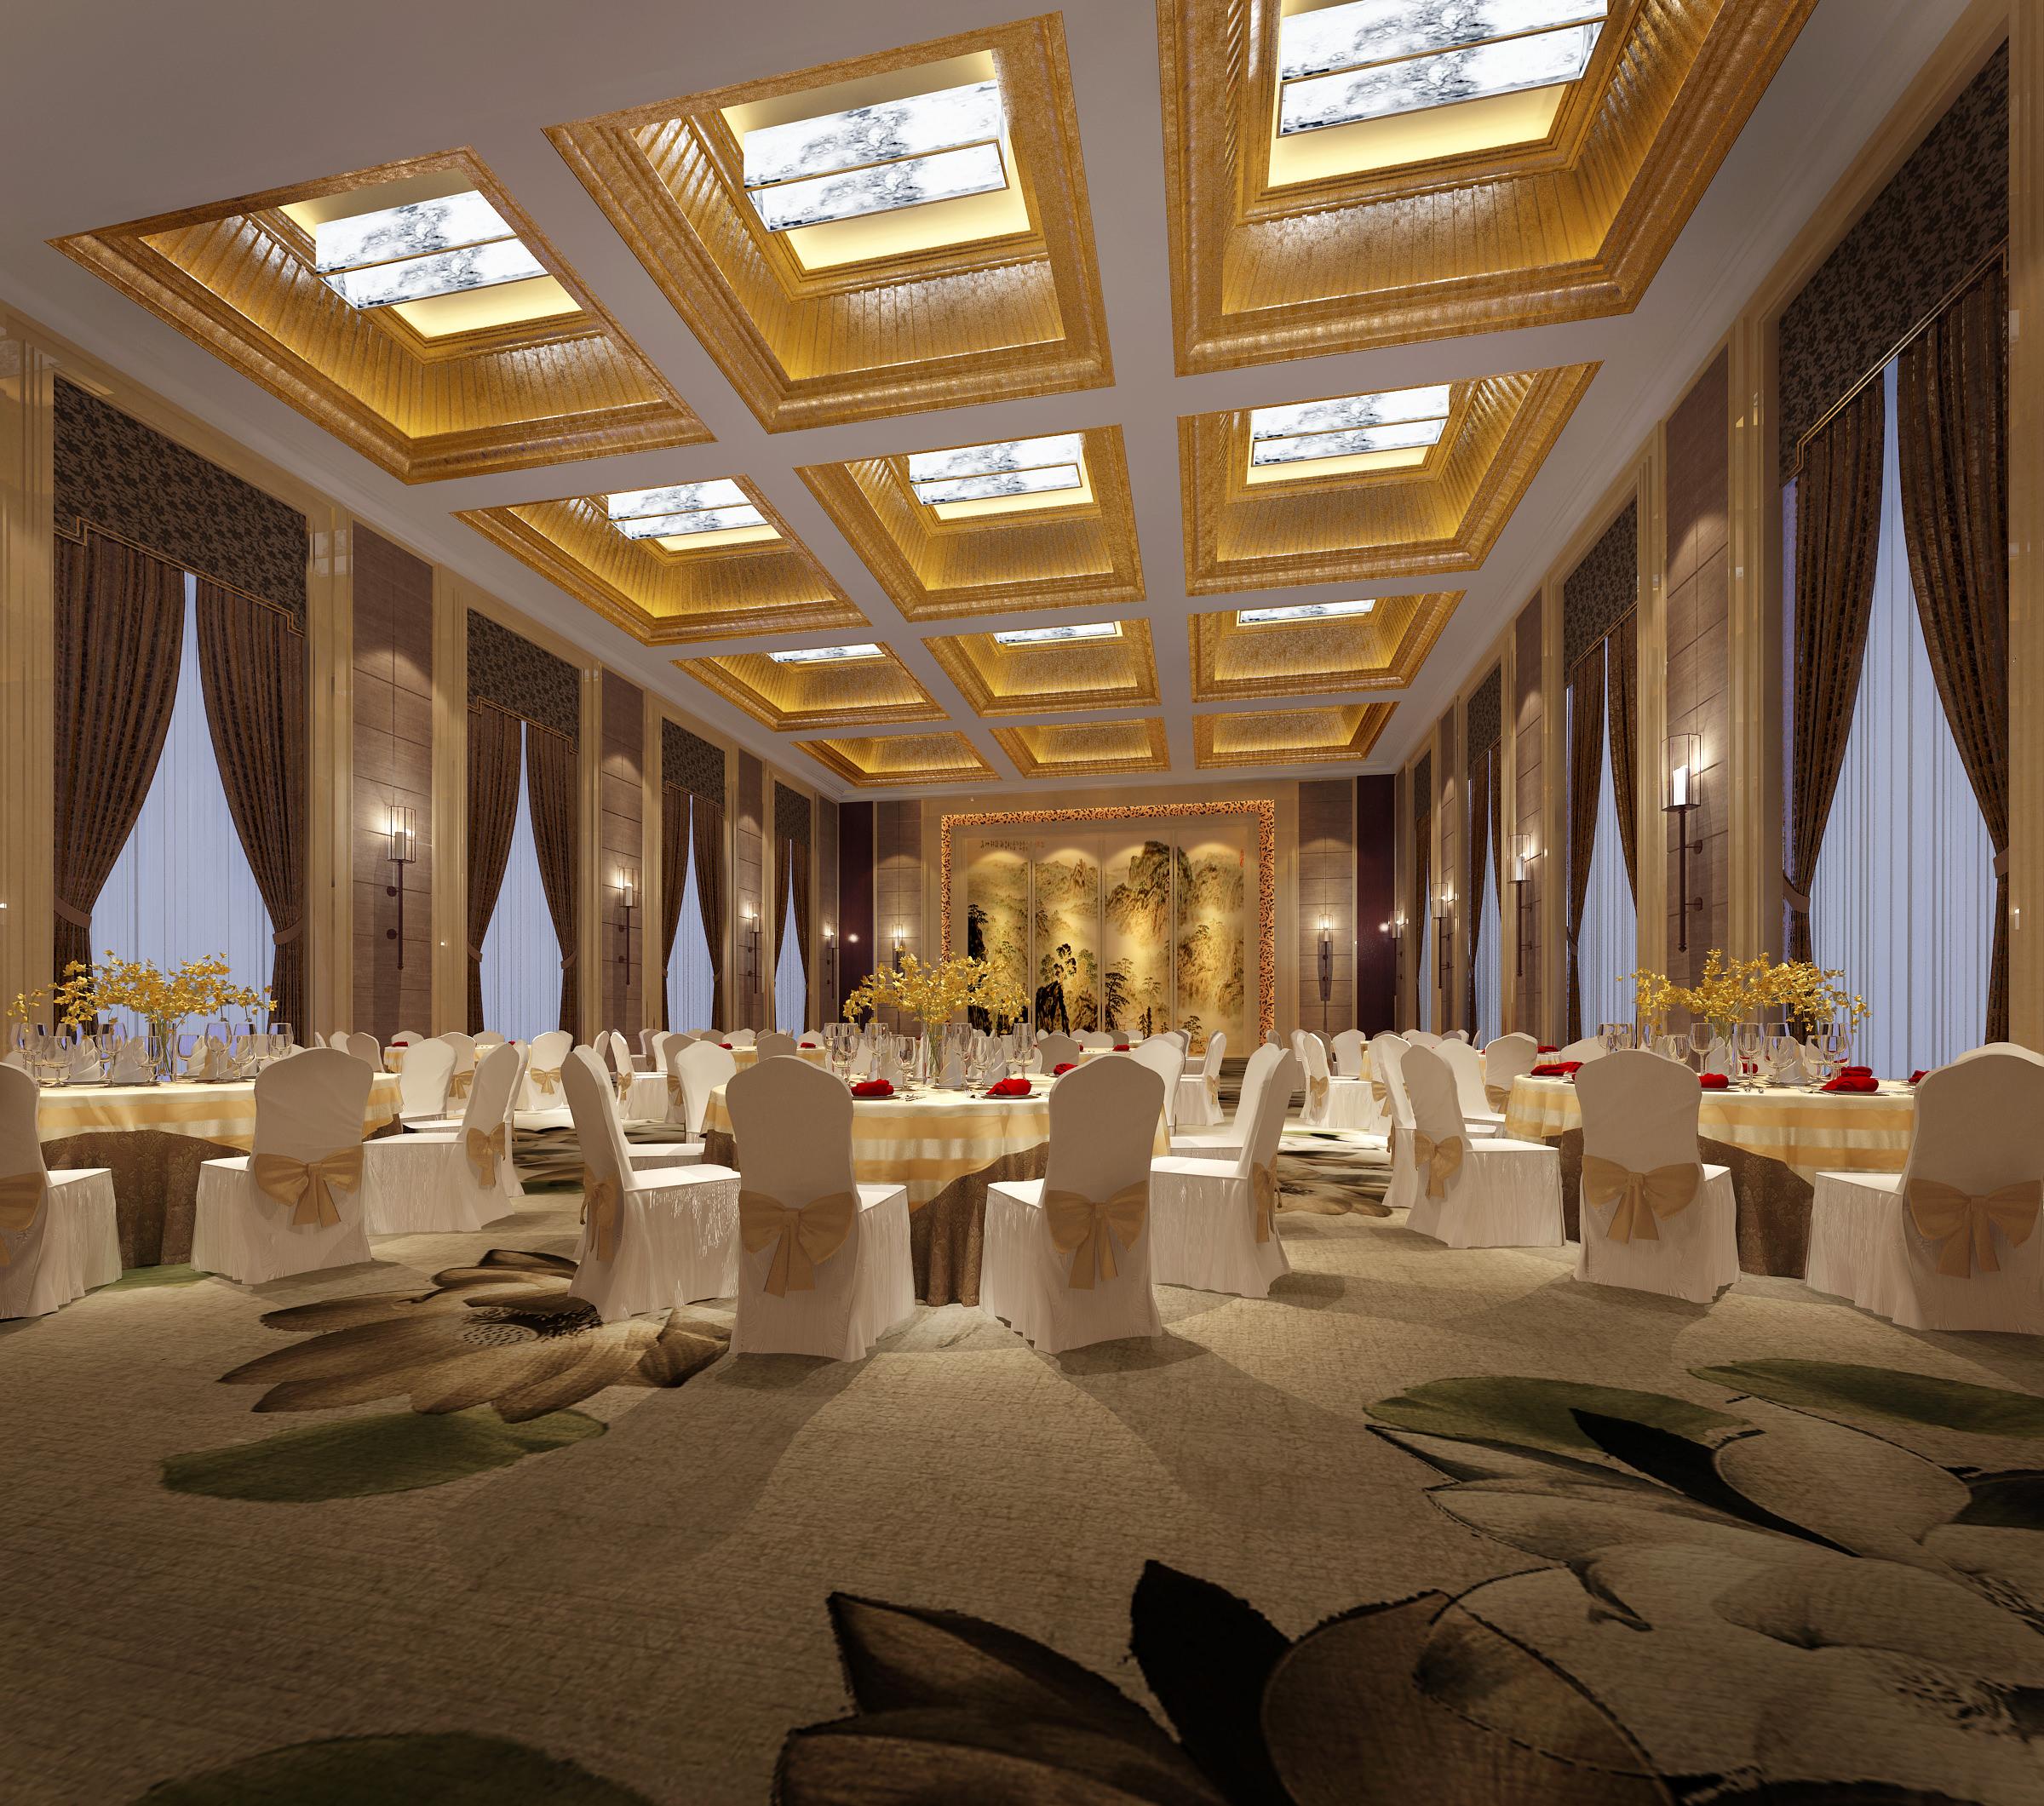 Banquet hall reception area download 3d house - 3d Model Banquet Hall